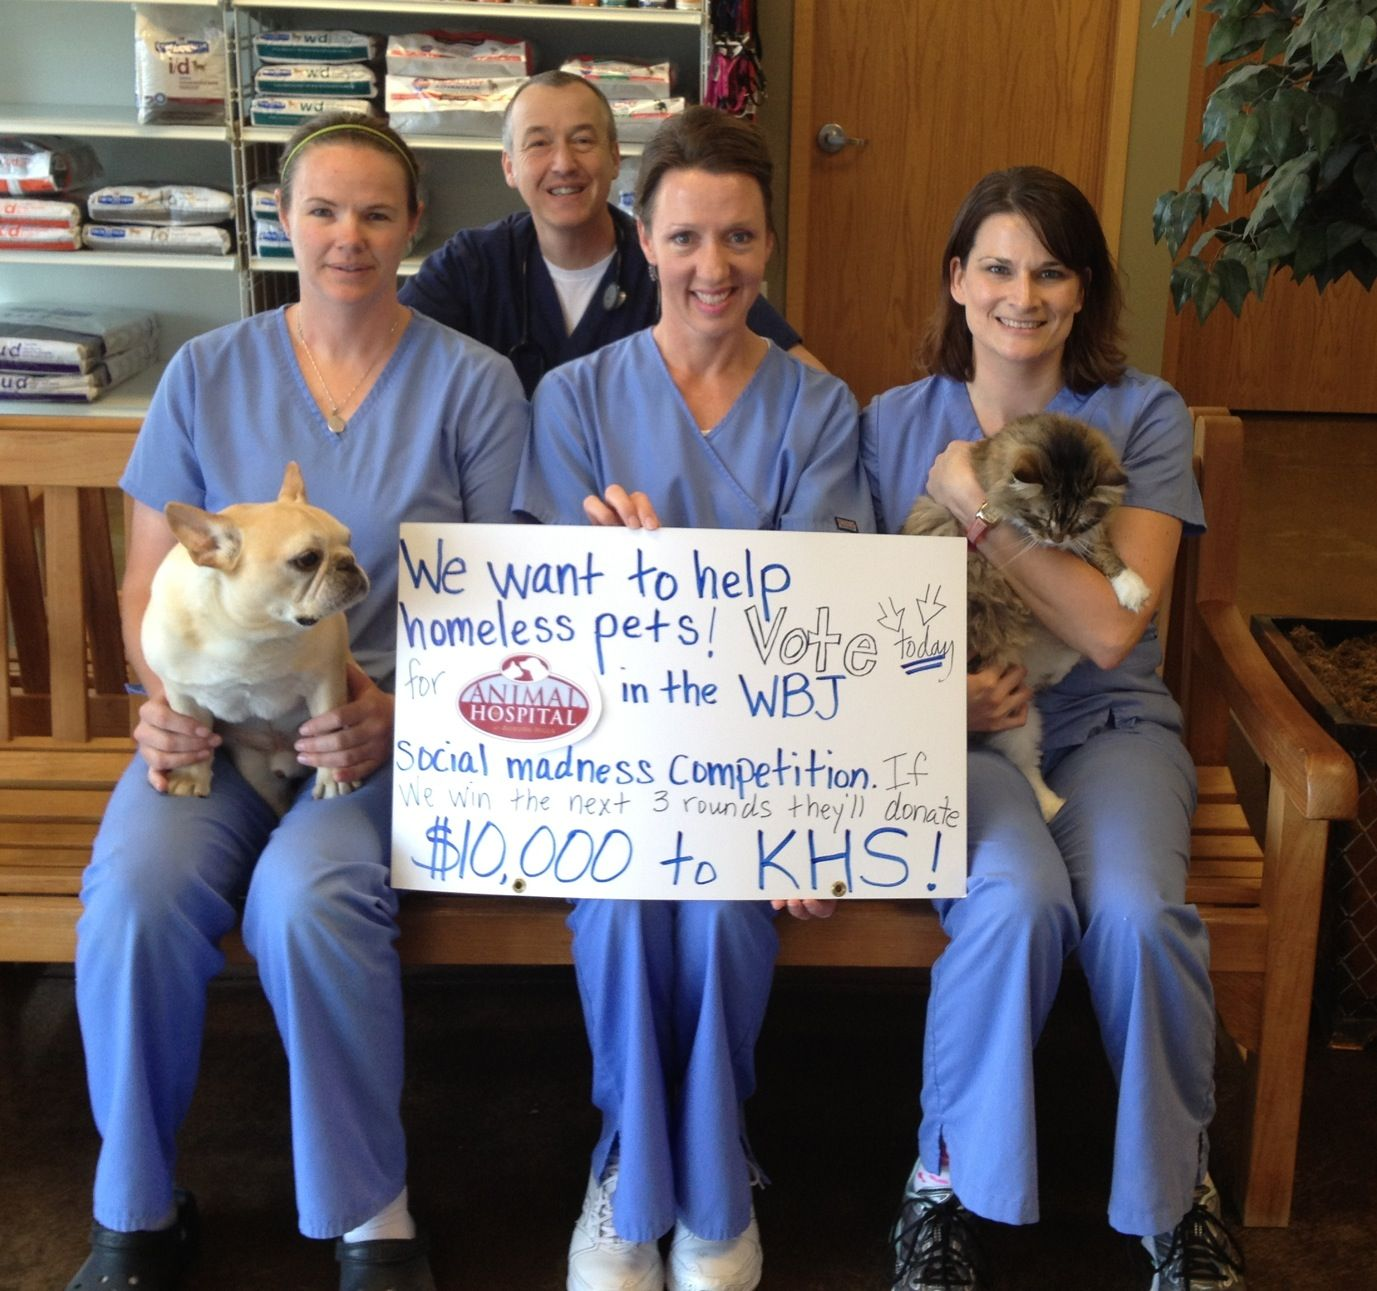 14++ Auburn hills animal hospital images